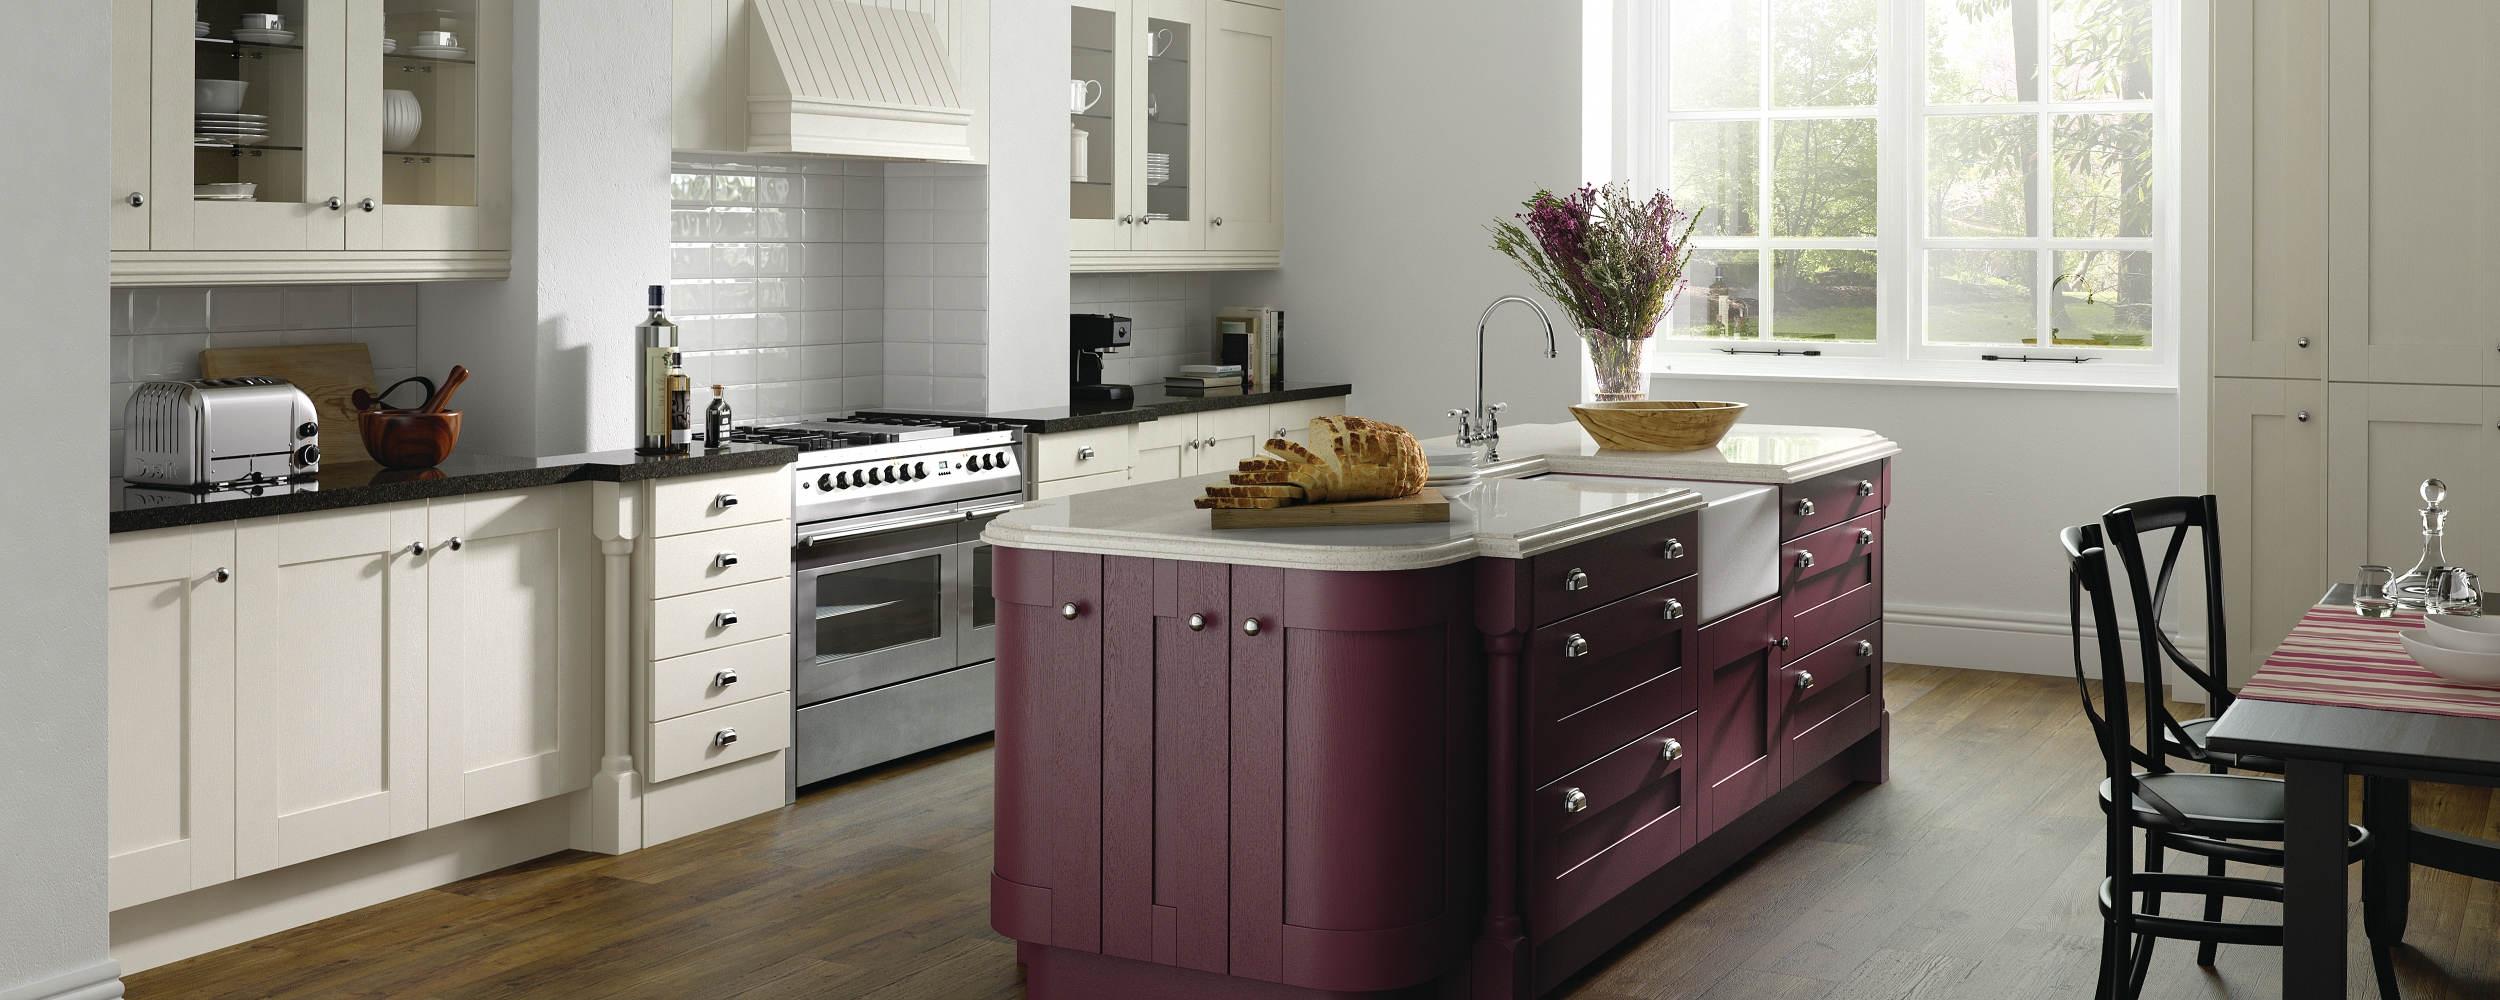 traditional kitchen scotland